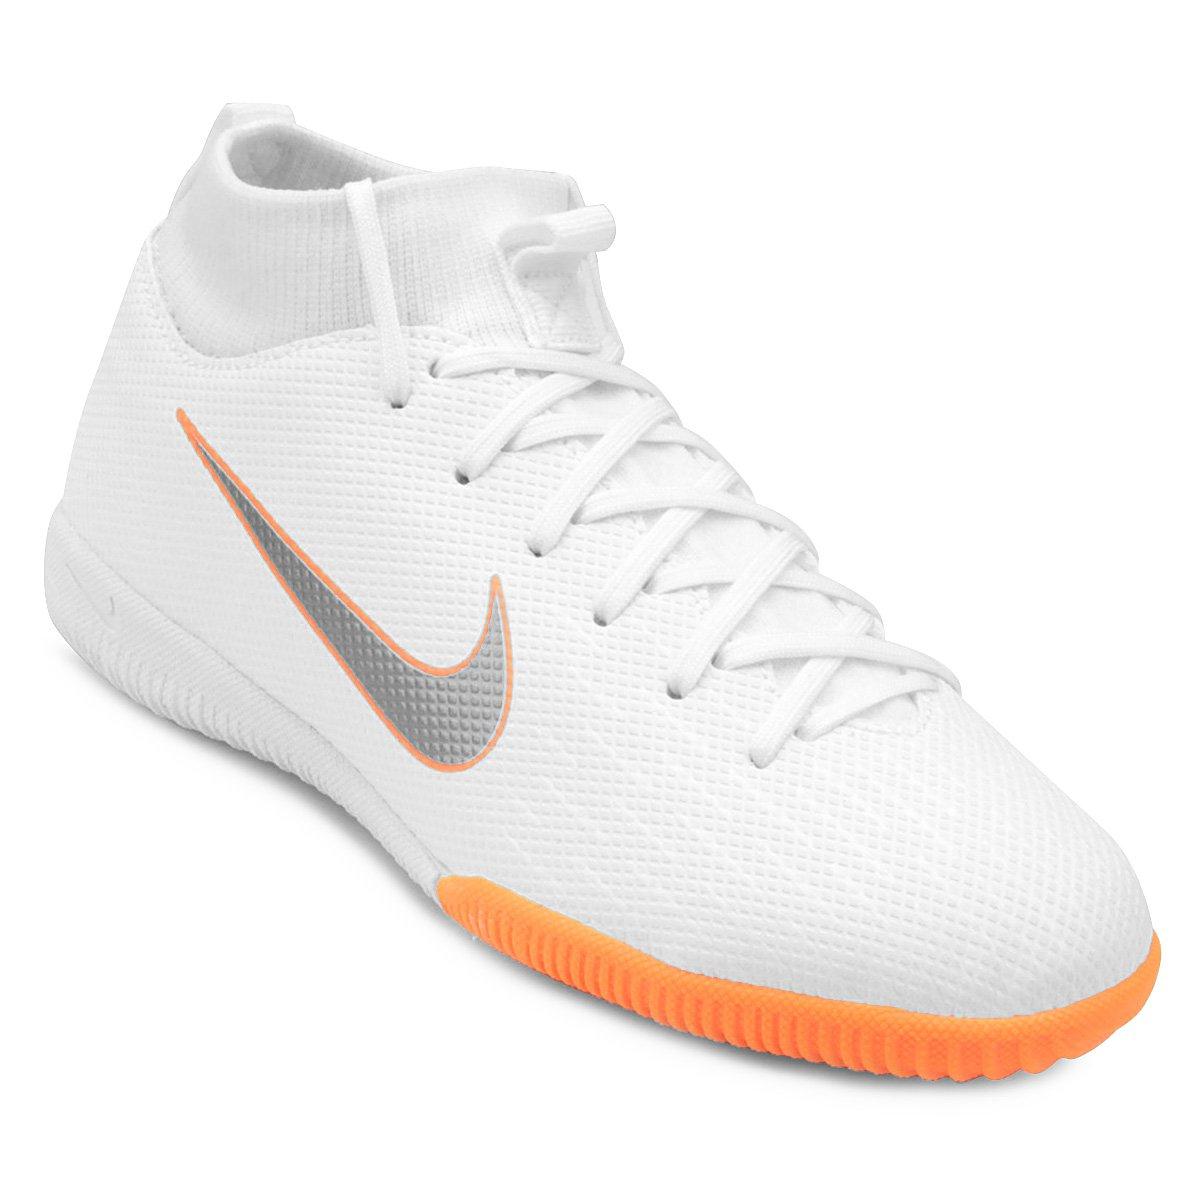 670cc064eb Chuteira Futsal Infantil Nike Mercurial Superfly 6 Academy - Branco ...